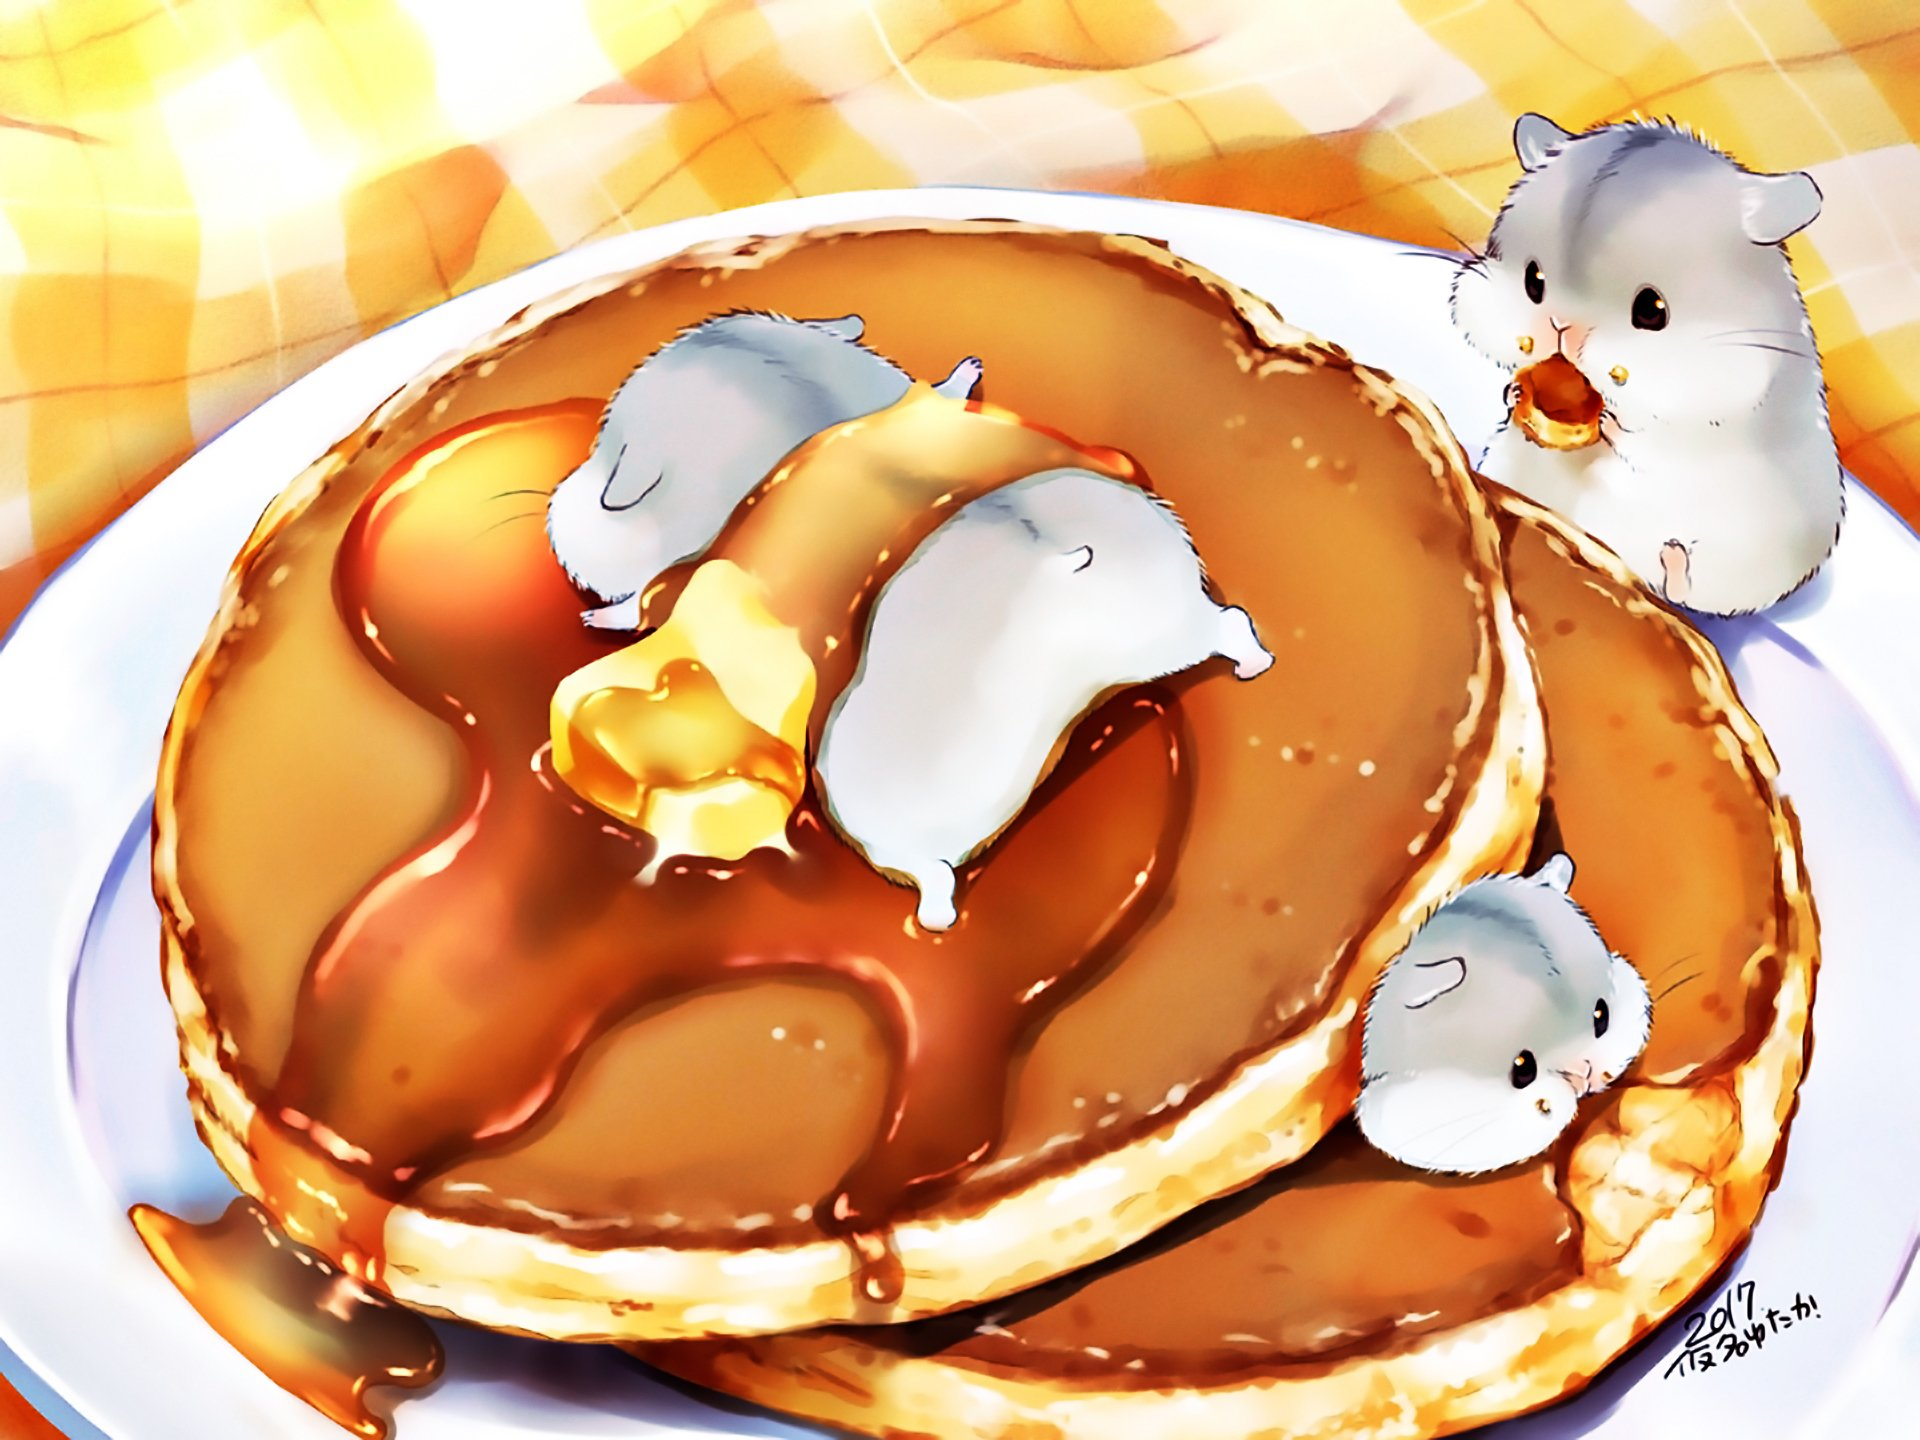 Anime - Original  Hamster Cute Cake Plate Wallpaper